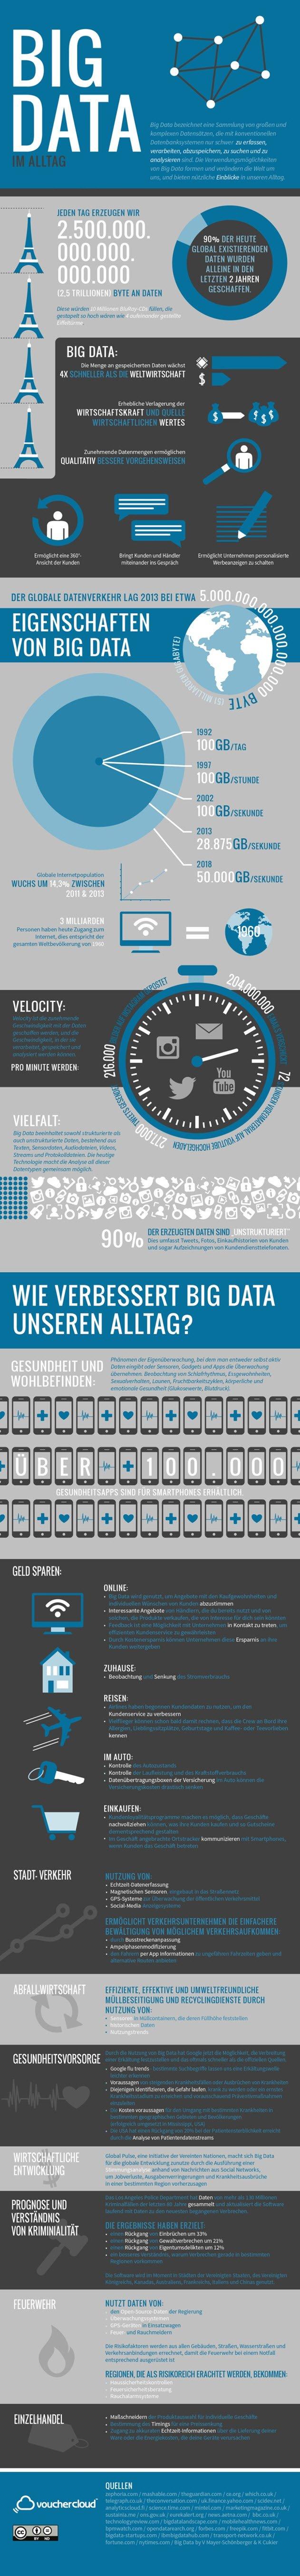 bigdata-infografik